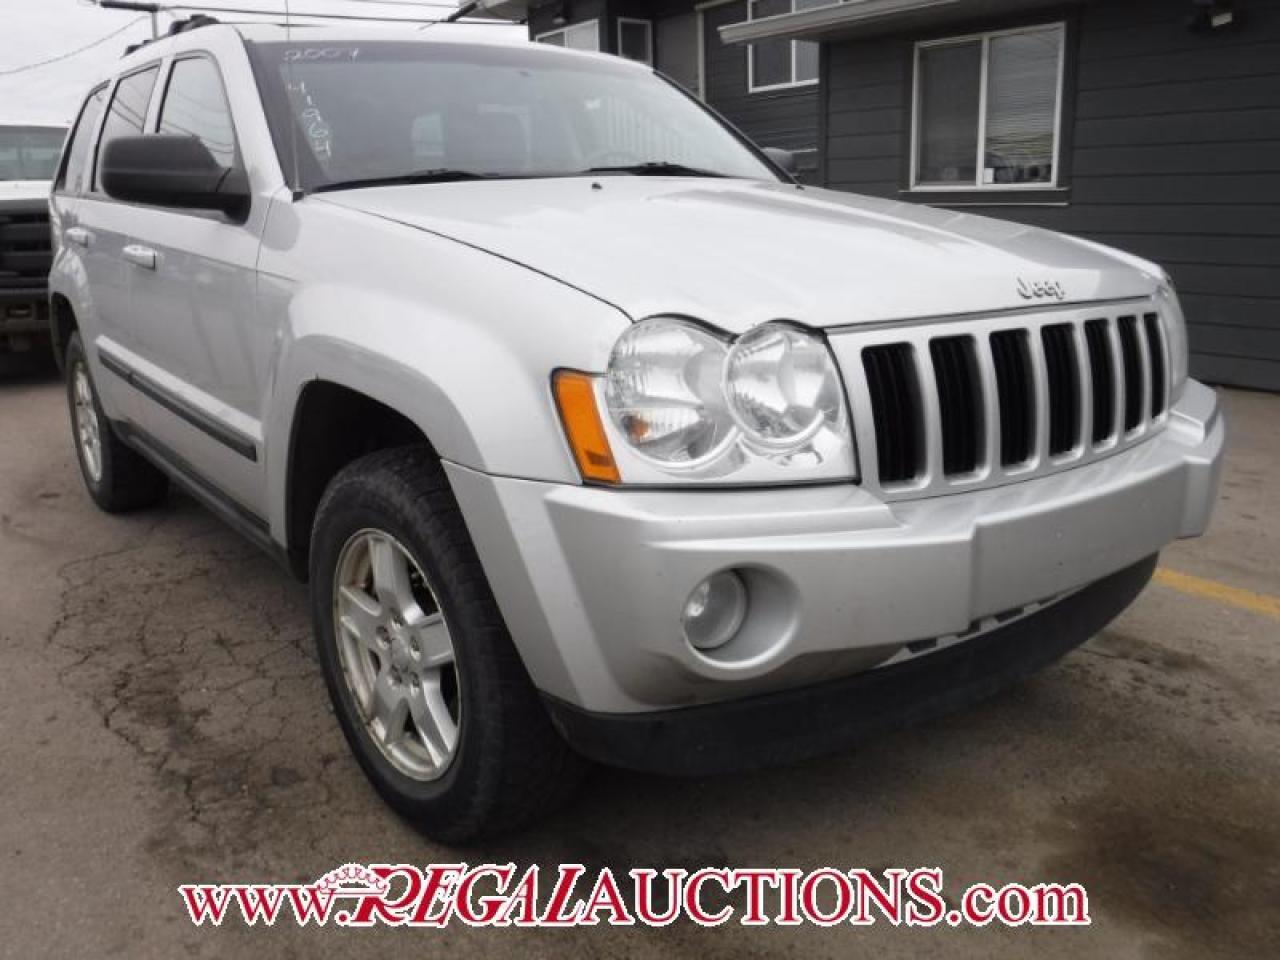 2007 Jeep Grand Cherokee Laredo 4D Utility 4WD